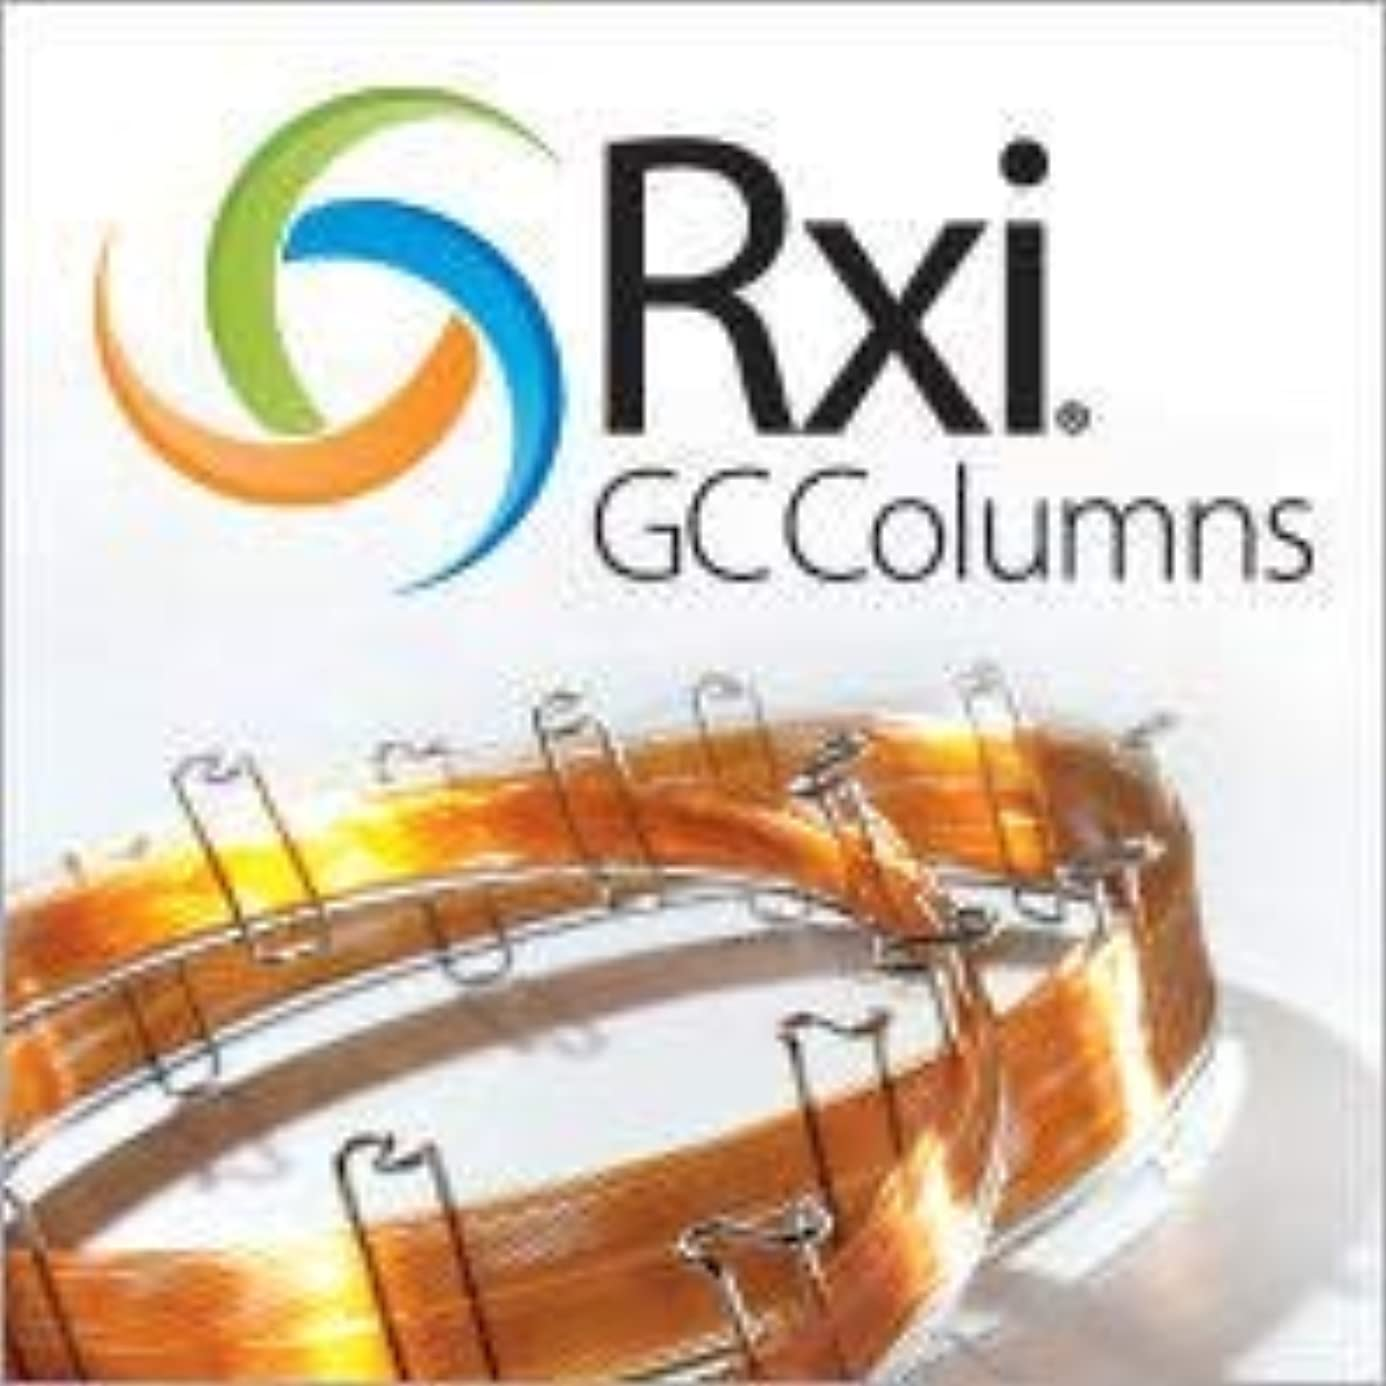 RESTEK 13954 RXI-1HT Column, Fused Silica, 0.32 mm ID, 0.1 μm Pore Size, 30 m Length byp4949485